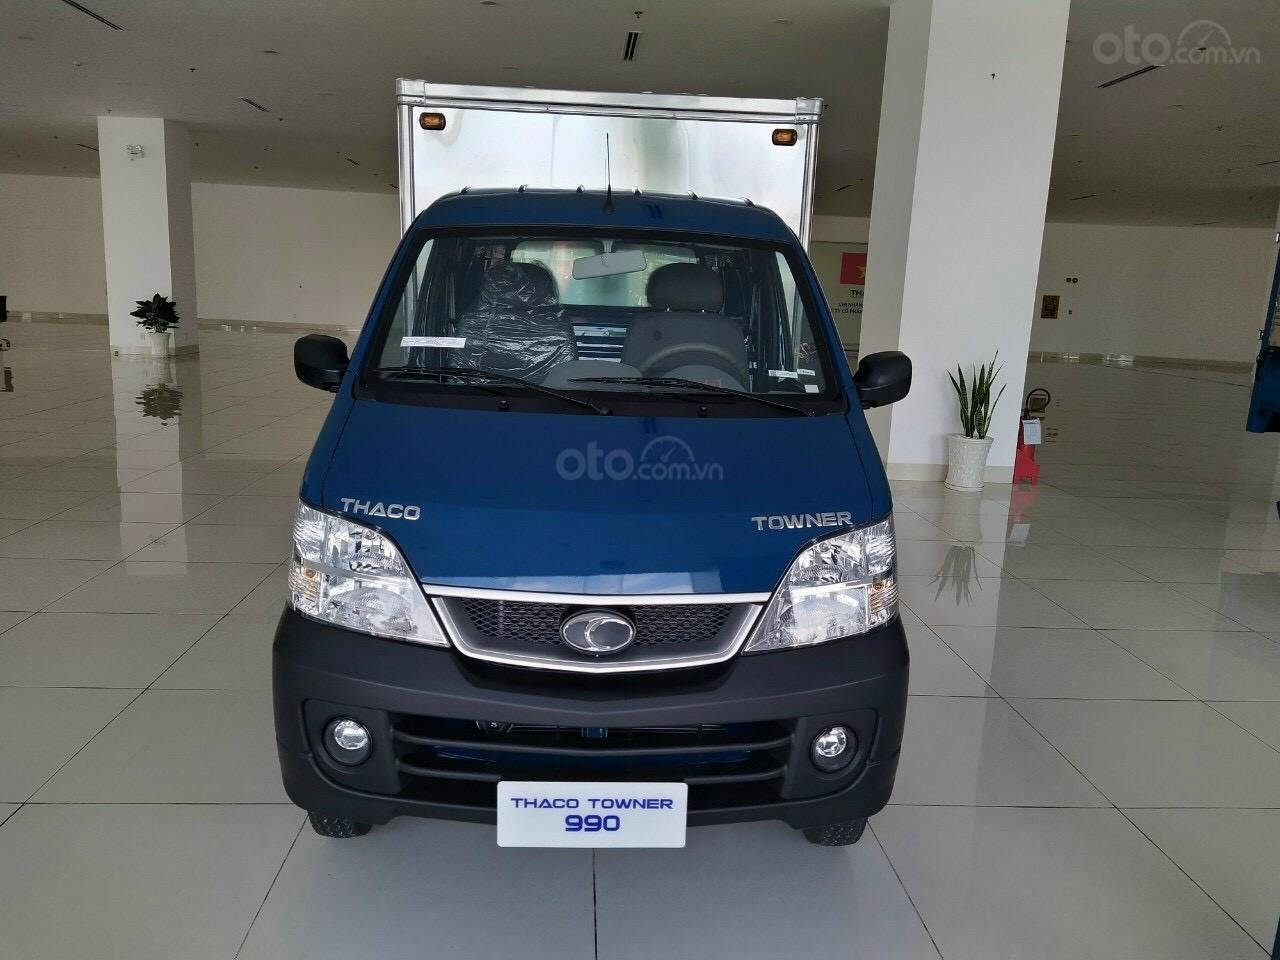 Xe tải 990kg Thaco Towner năm 2021 (1)